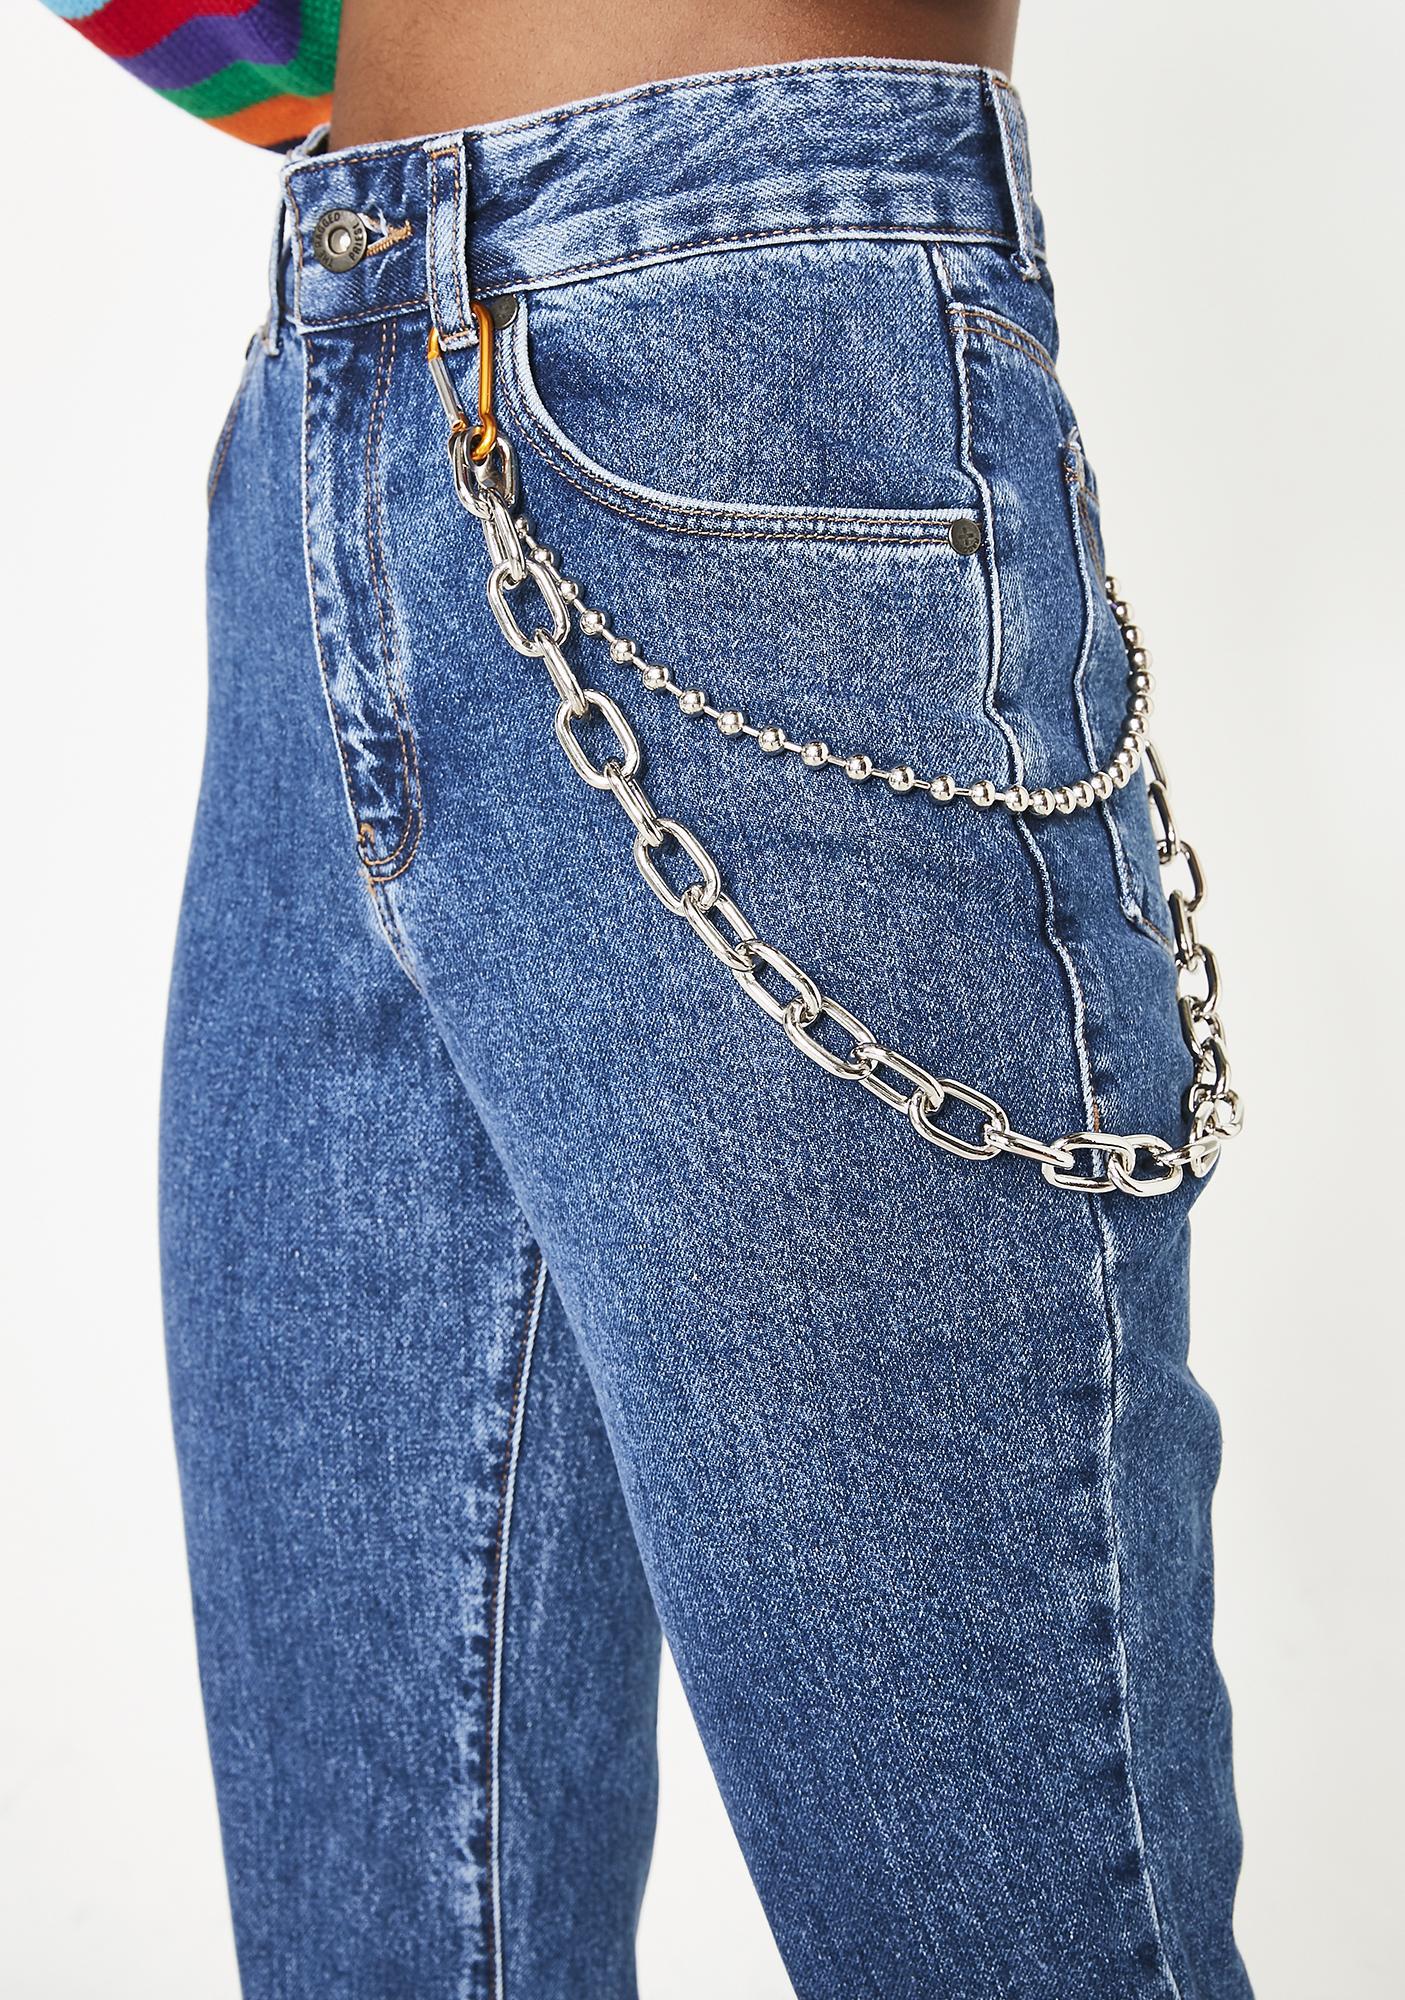 The Ragged Priest Summit Jeans